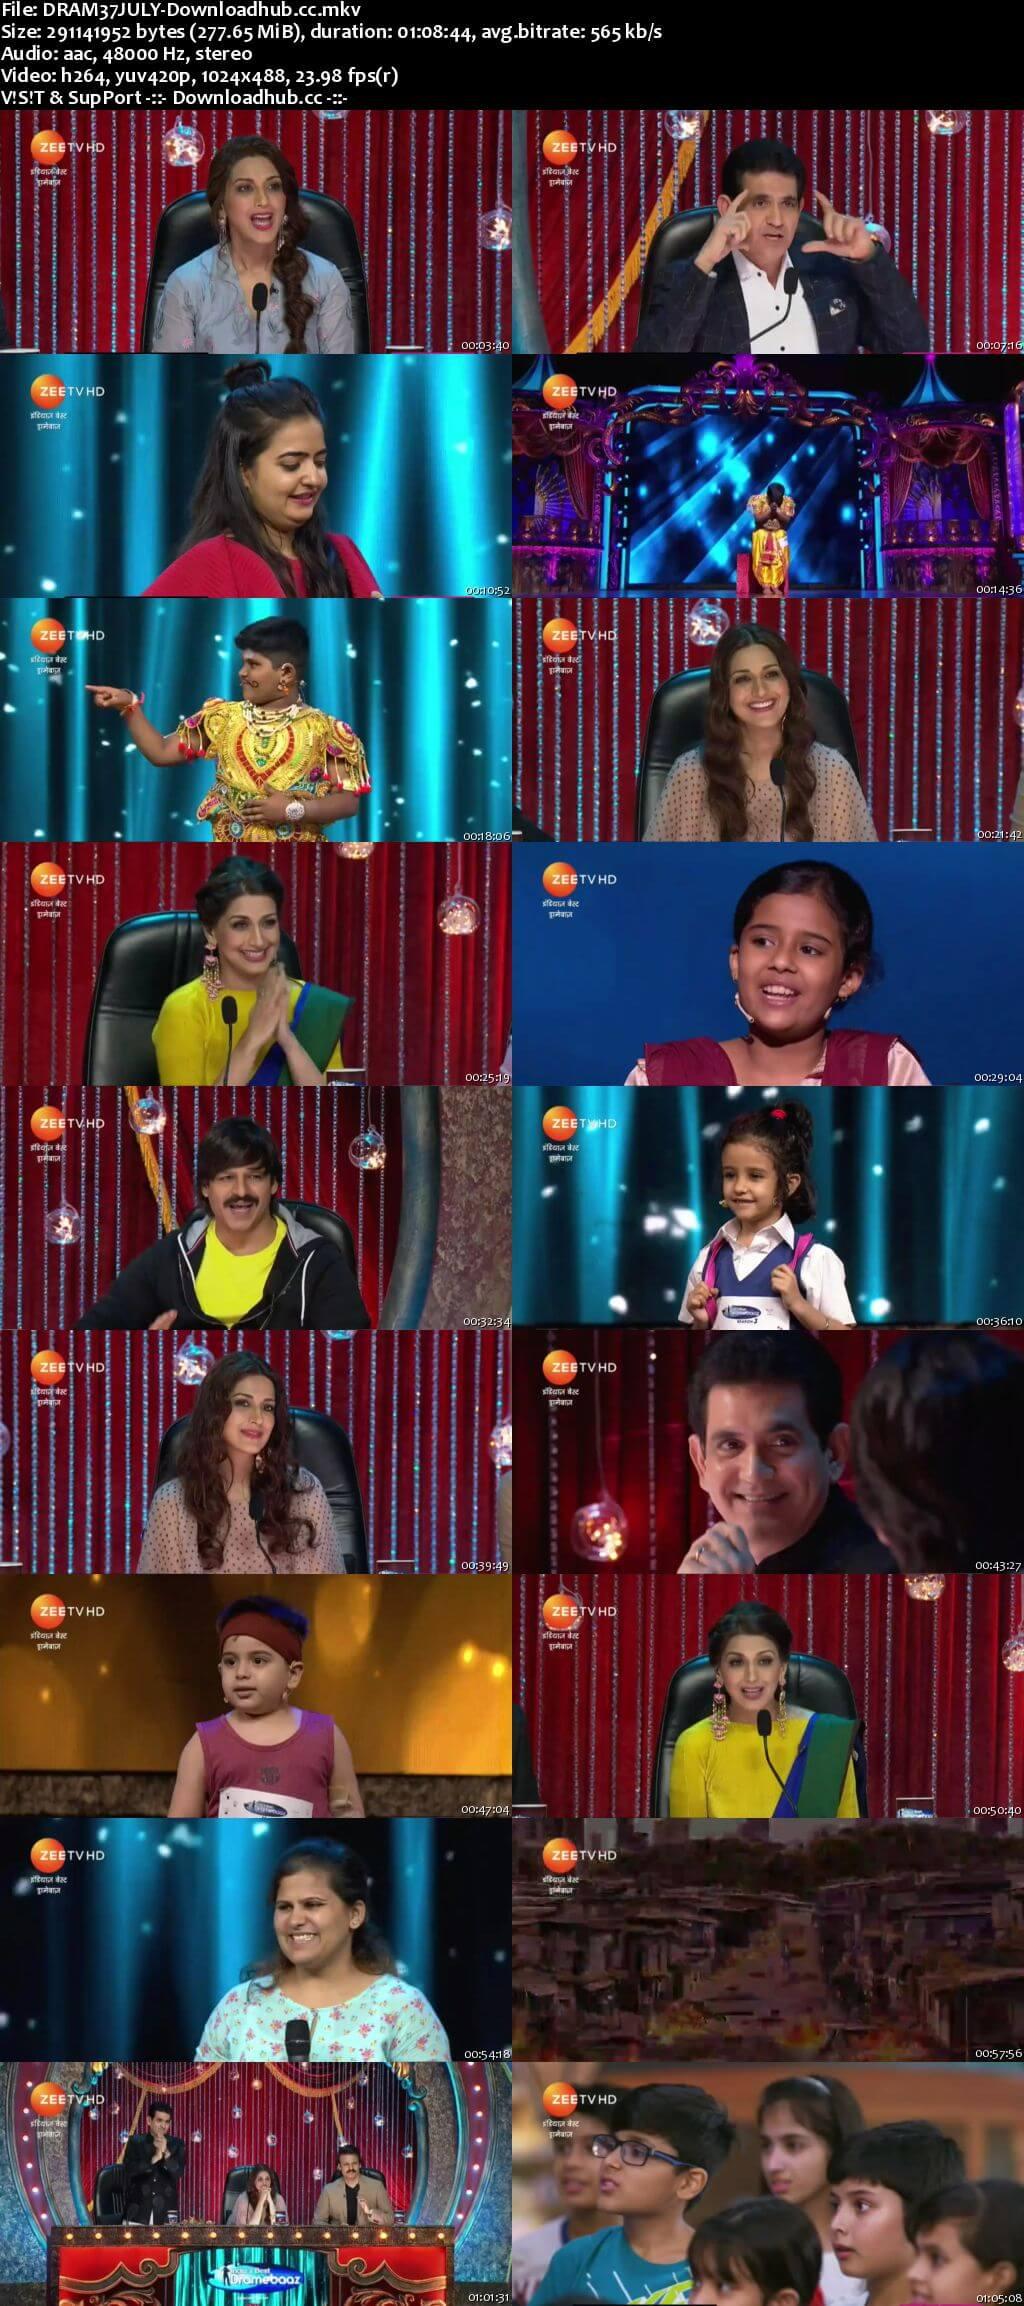 Indias Best Dramebaaz Season 3 07 July 2018 Episode 03 HDTV 480p